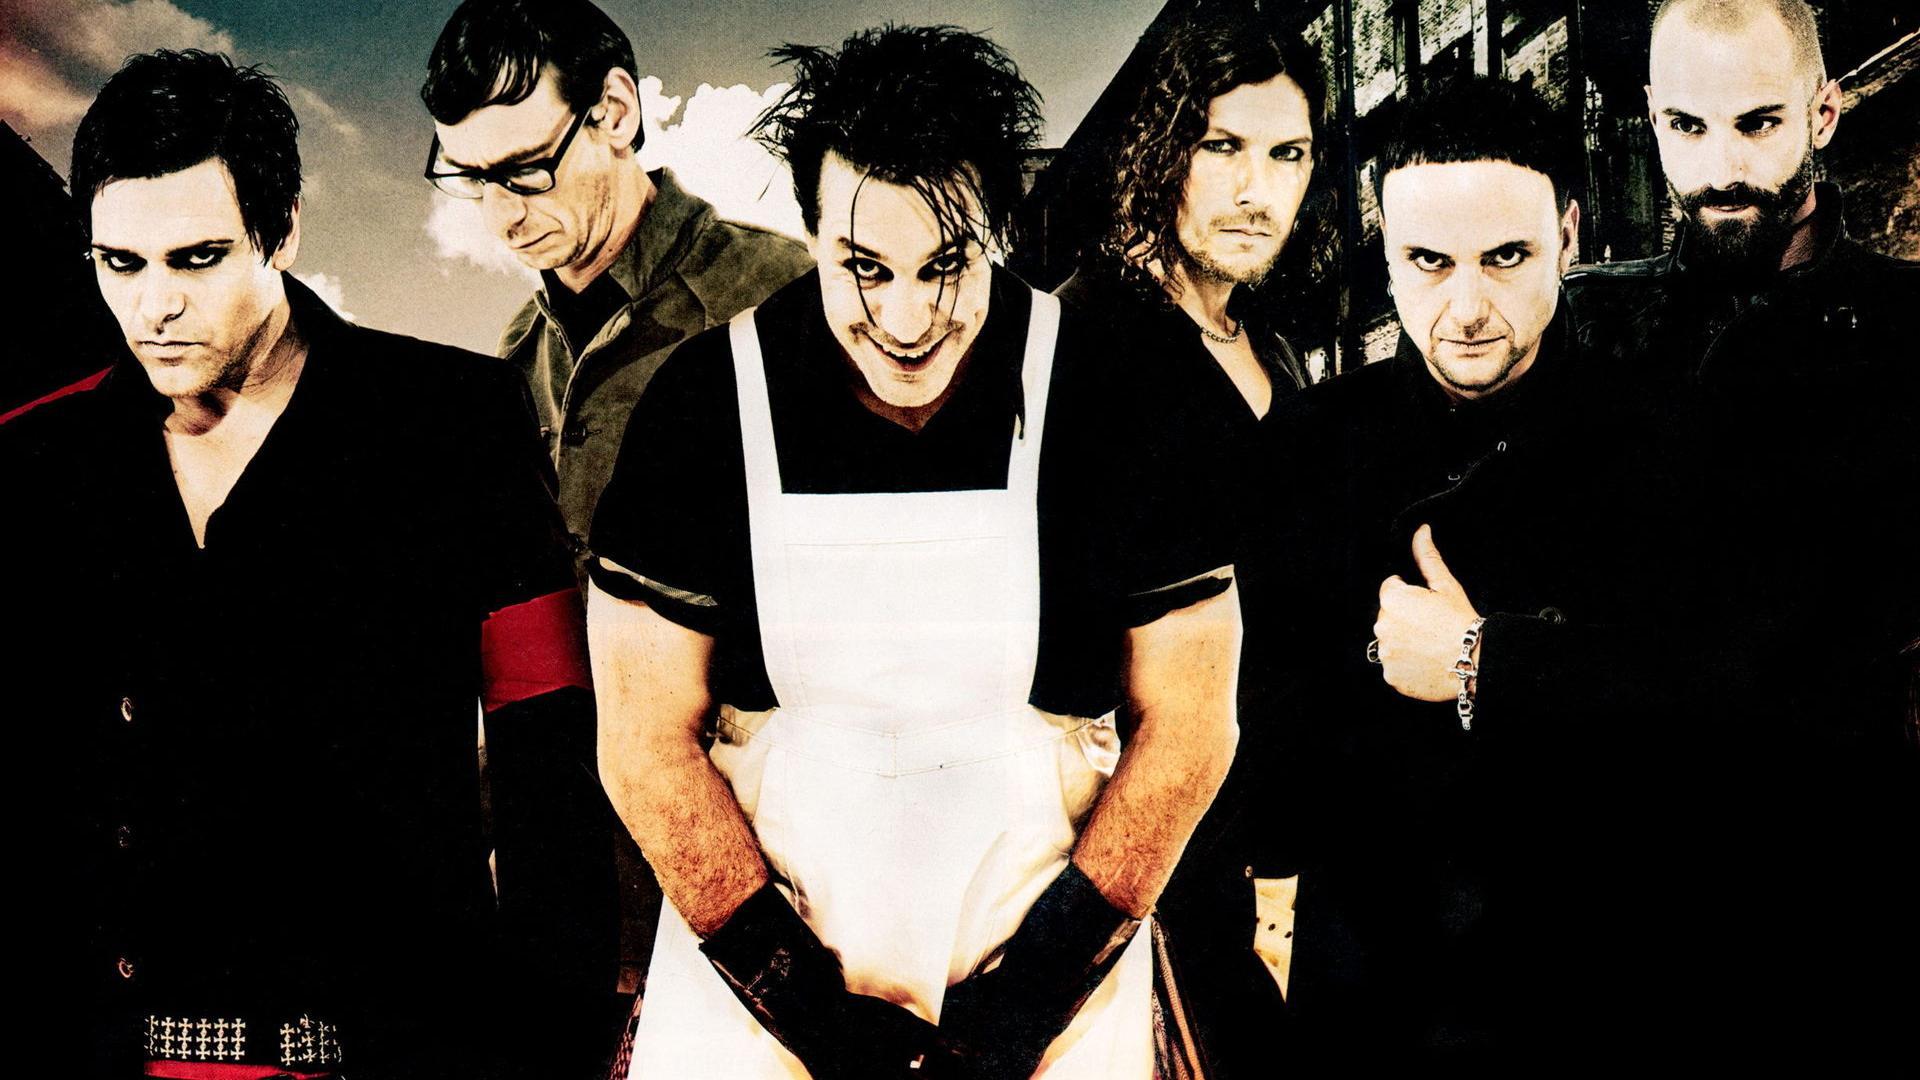 Rammstein, группа, till, richard, paul, oliver обои для рабочего ...